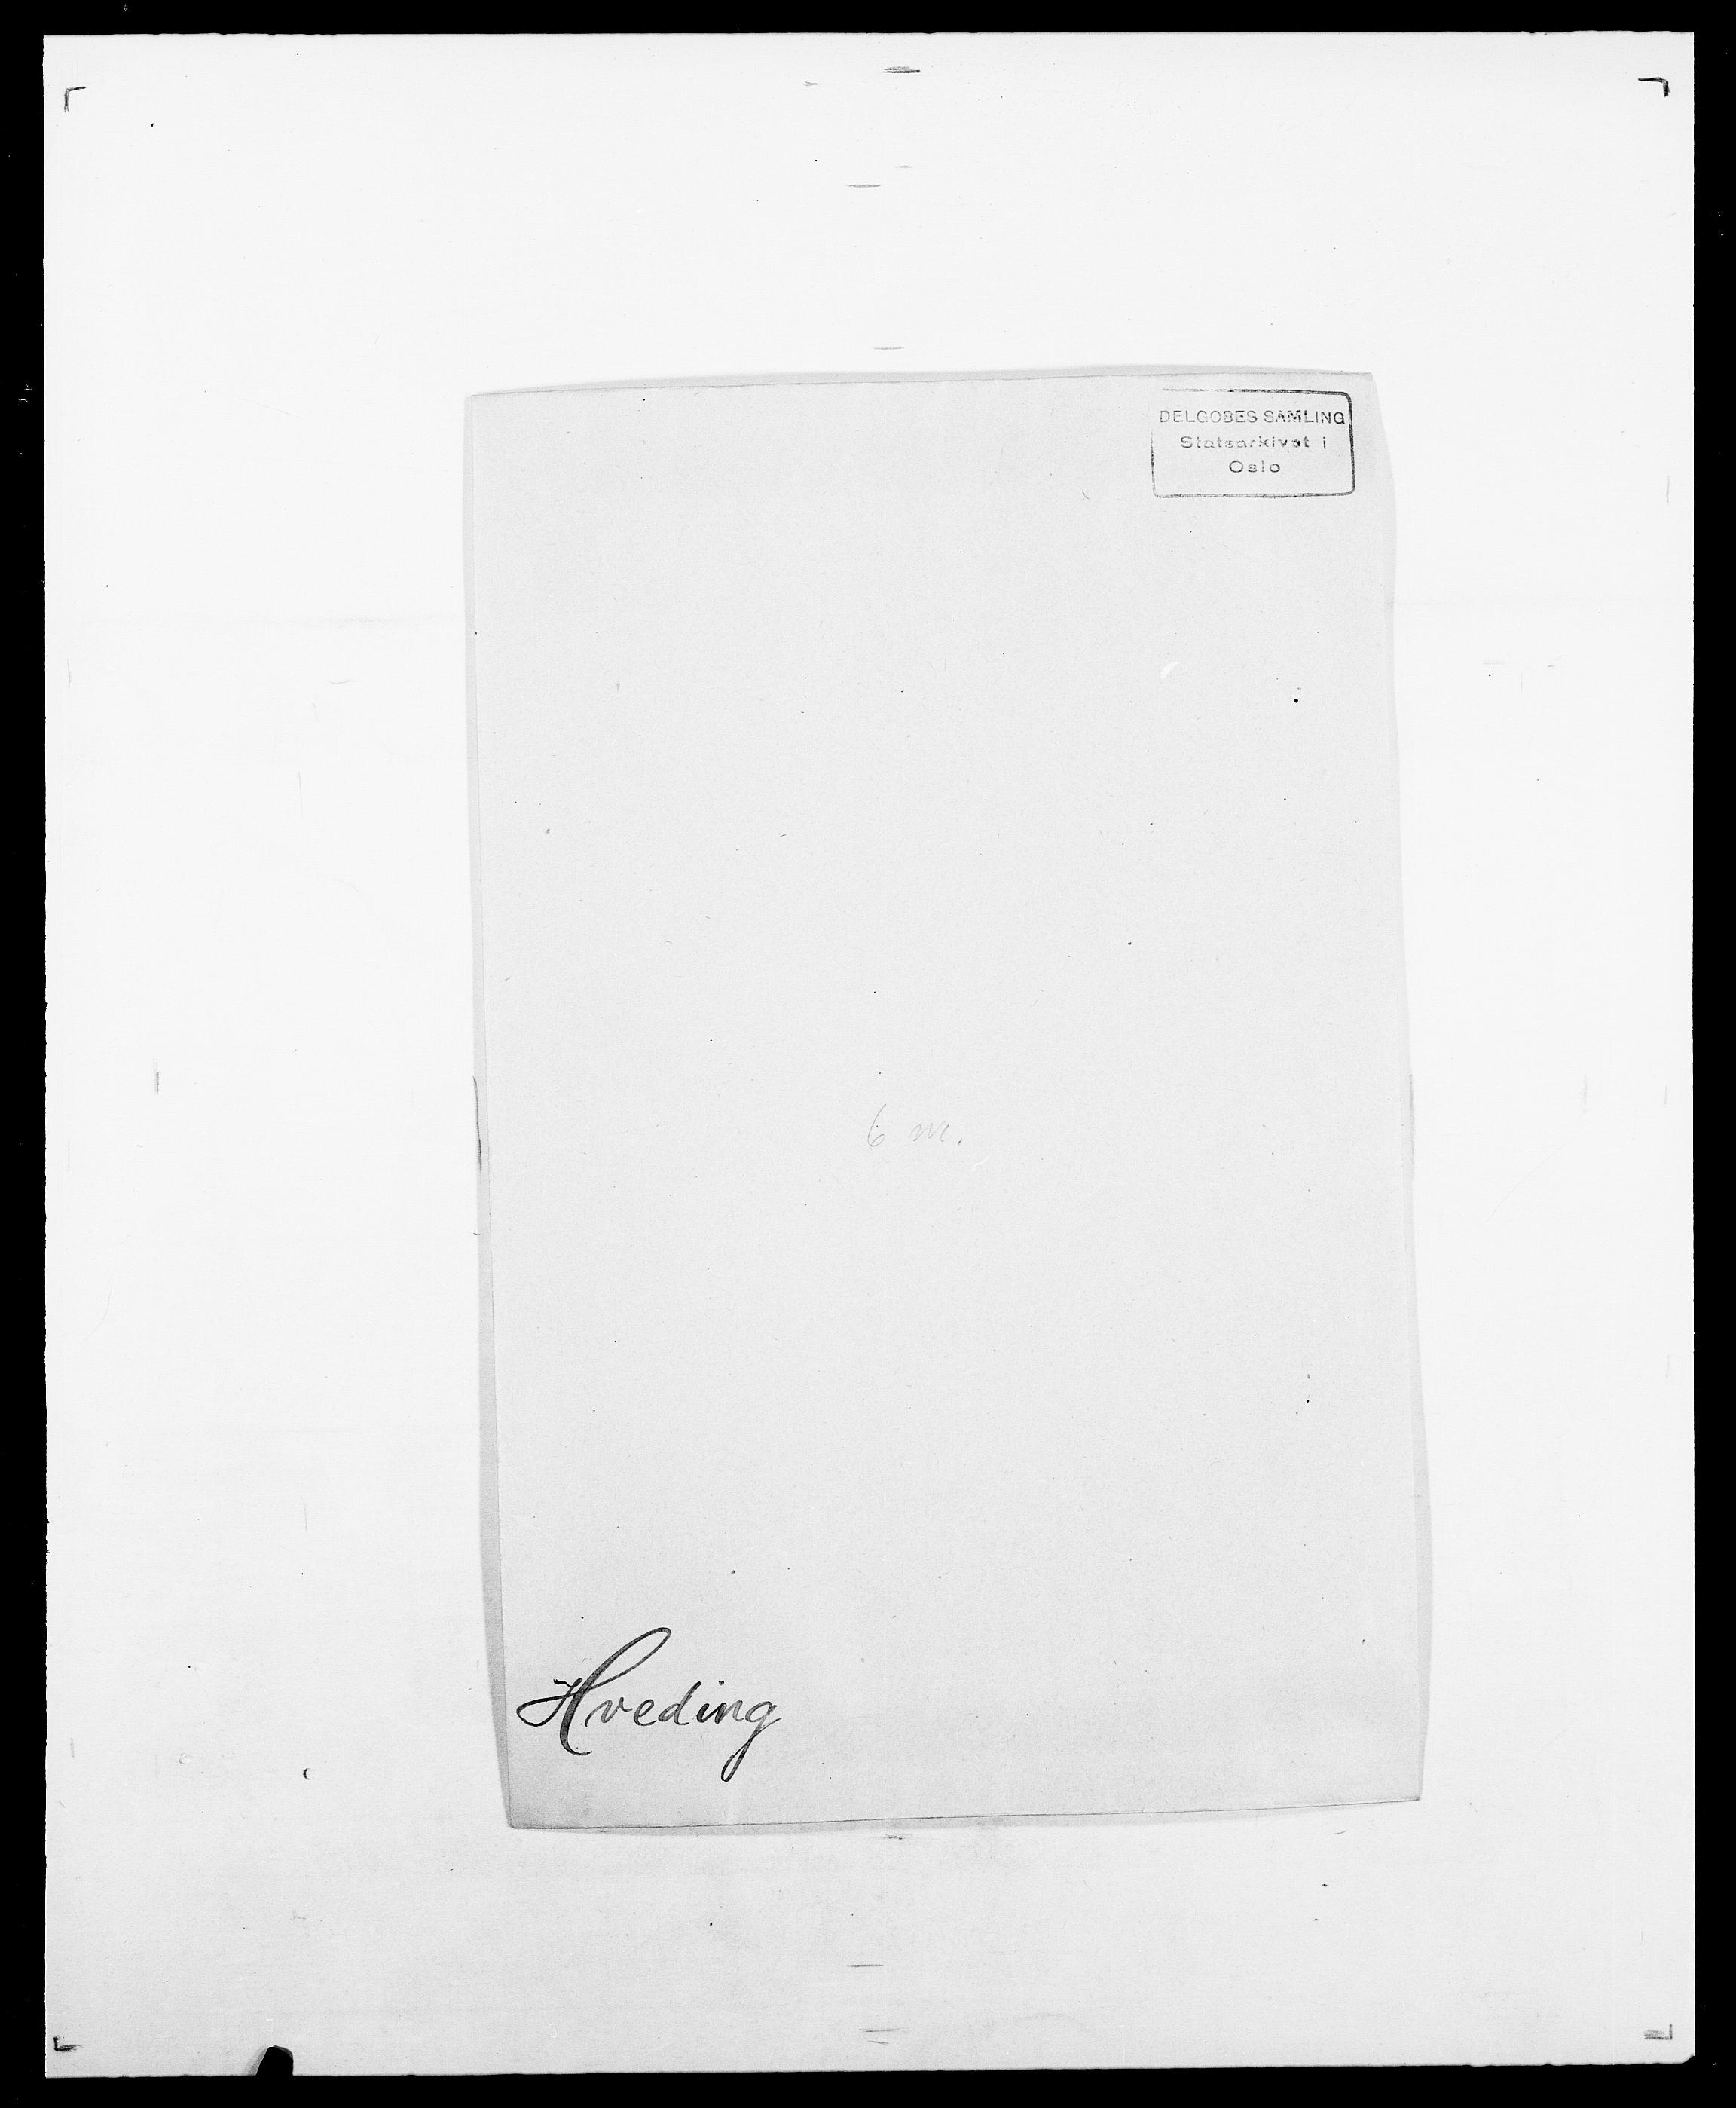 SAO, Delgobe, Charles Antoine - samling, D/Da/L0019: van der Hude - Joys, s. 135